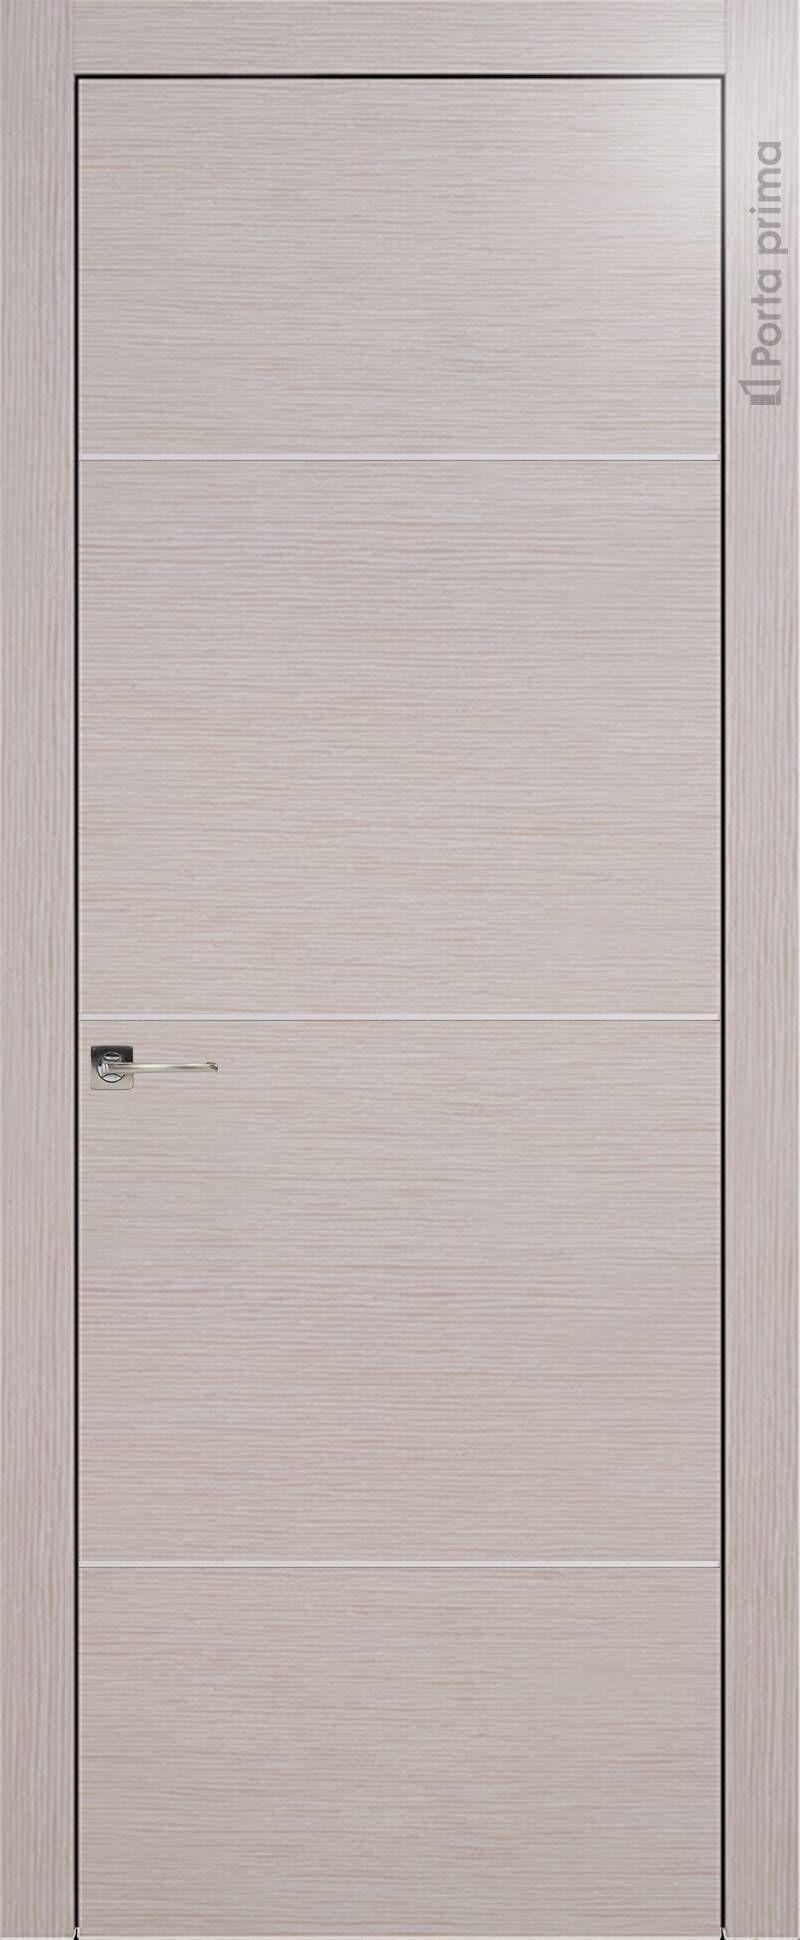 Tivoli Г-3 цвет - Дымчатый дуб Без стекла (ДГ)